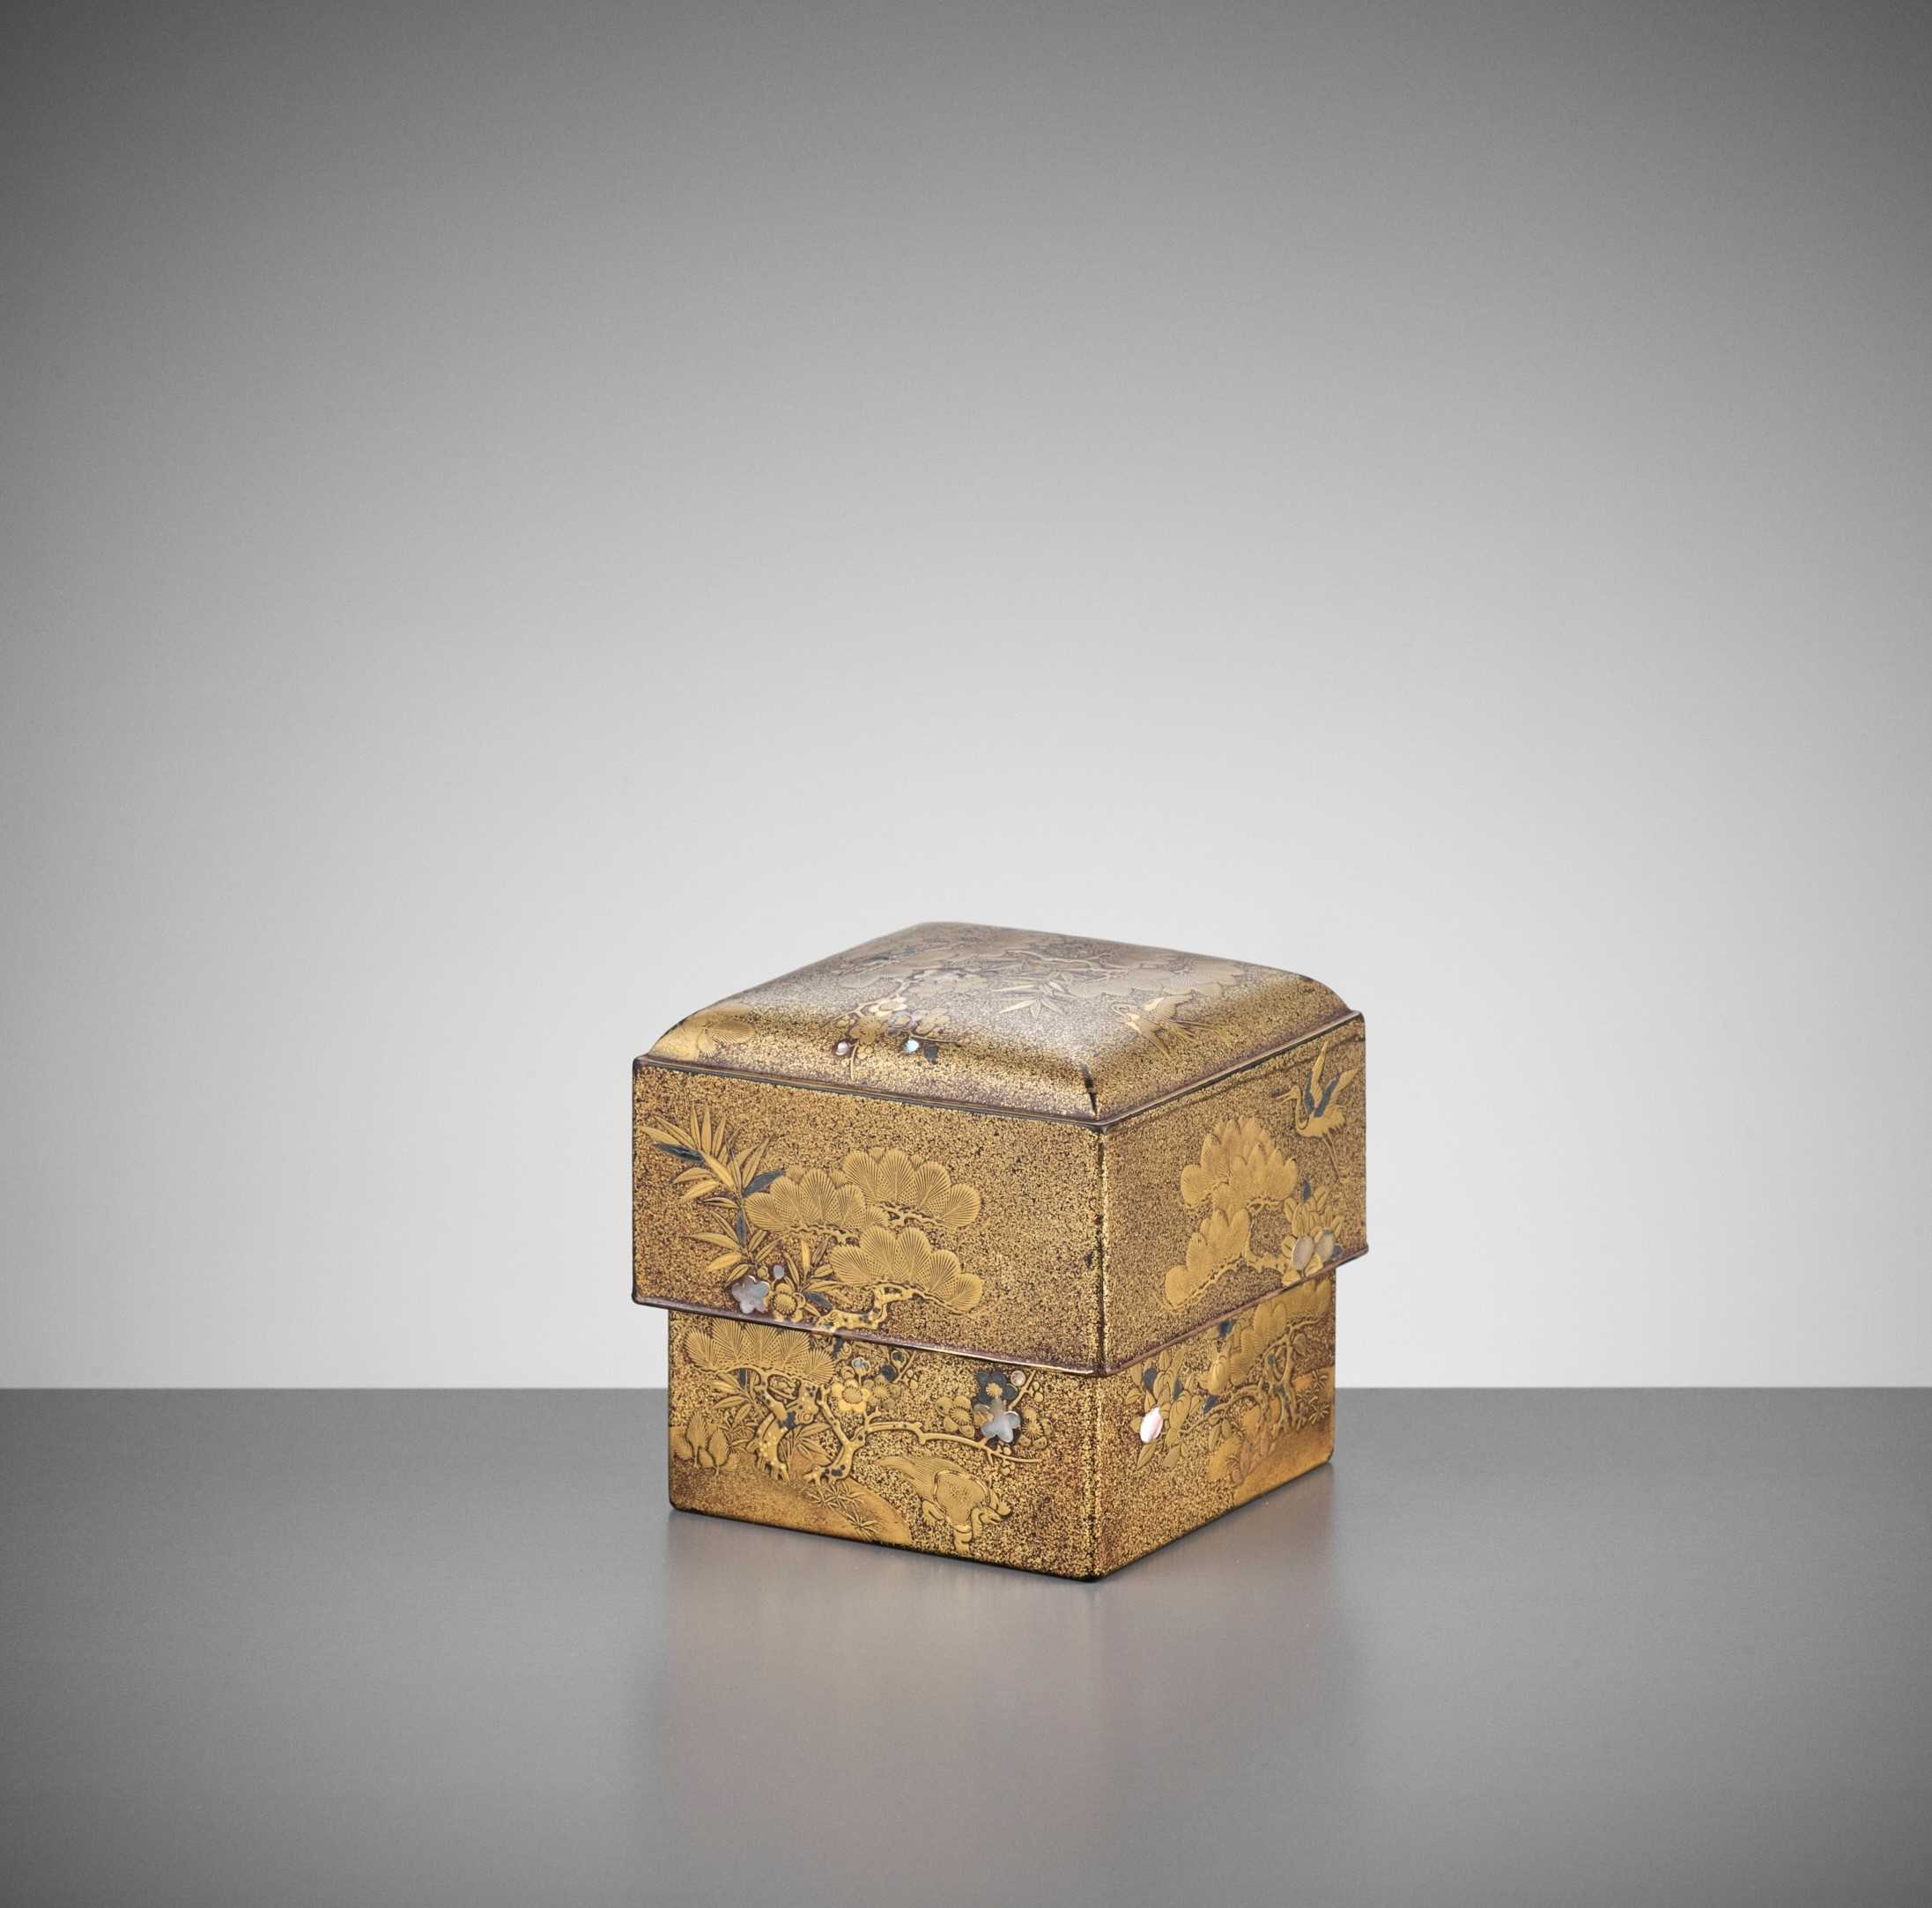 Lot 110 - A RARE LACQUER COSMETIC BOX AND COVER WITH CRANES, MINOGAME AND SHOCHIKUBAI